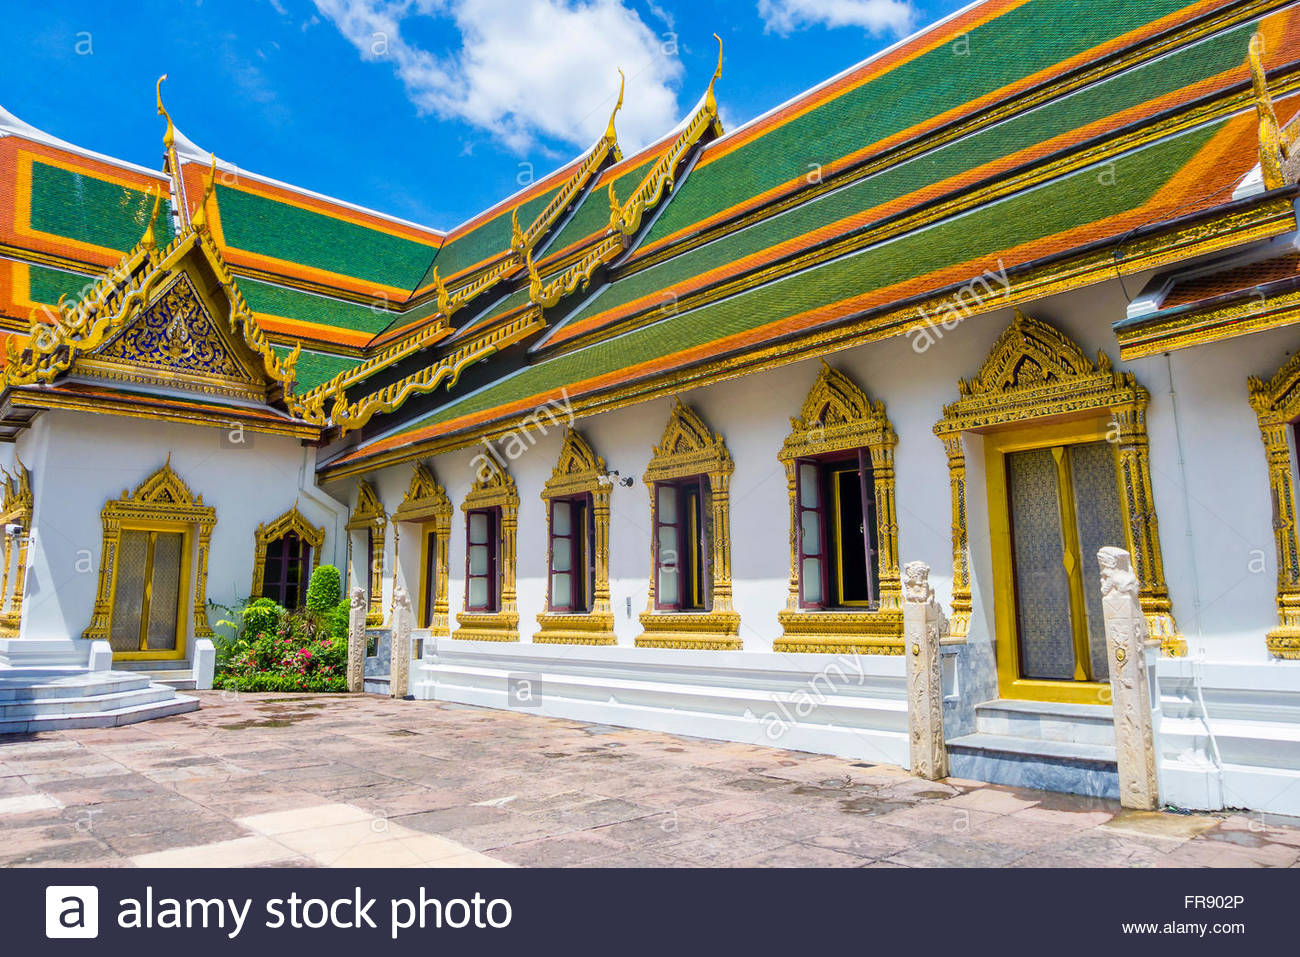 Phra Thinang Amarin Winitchai throne hall, Grand Palace complex, Bangkok, Thailand - Stock Image